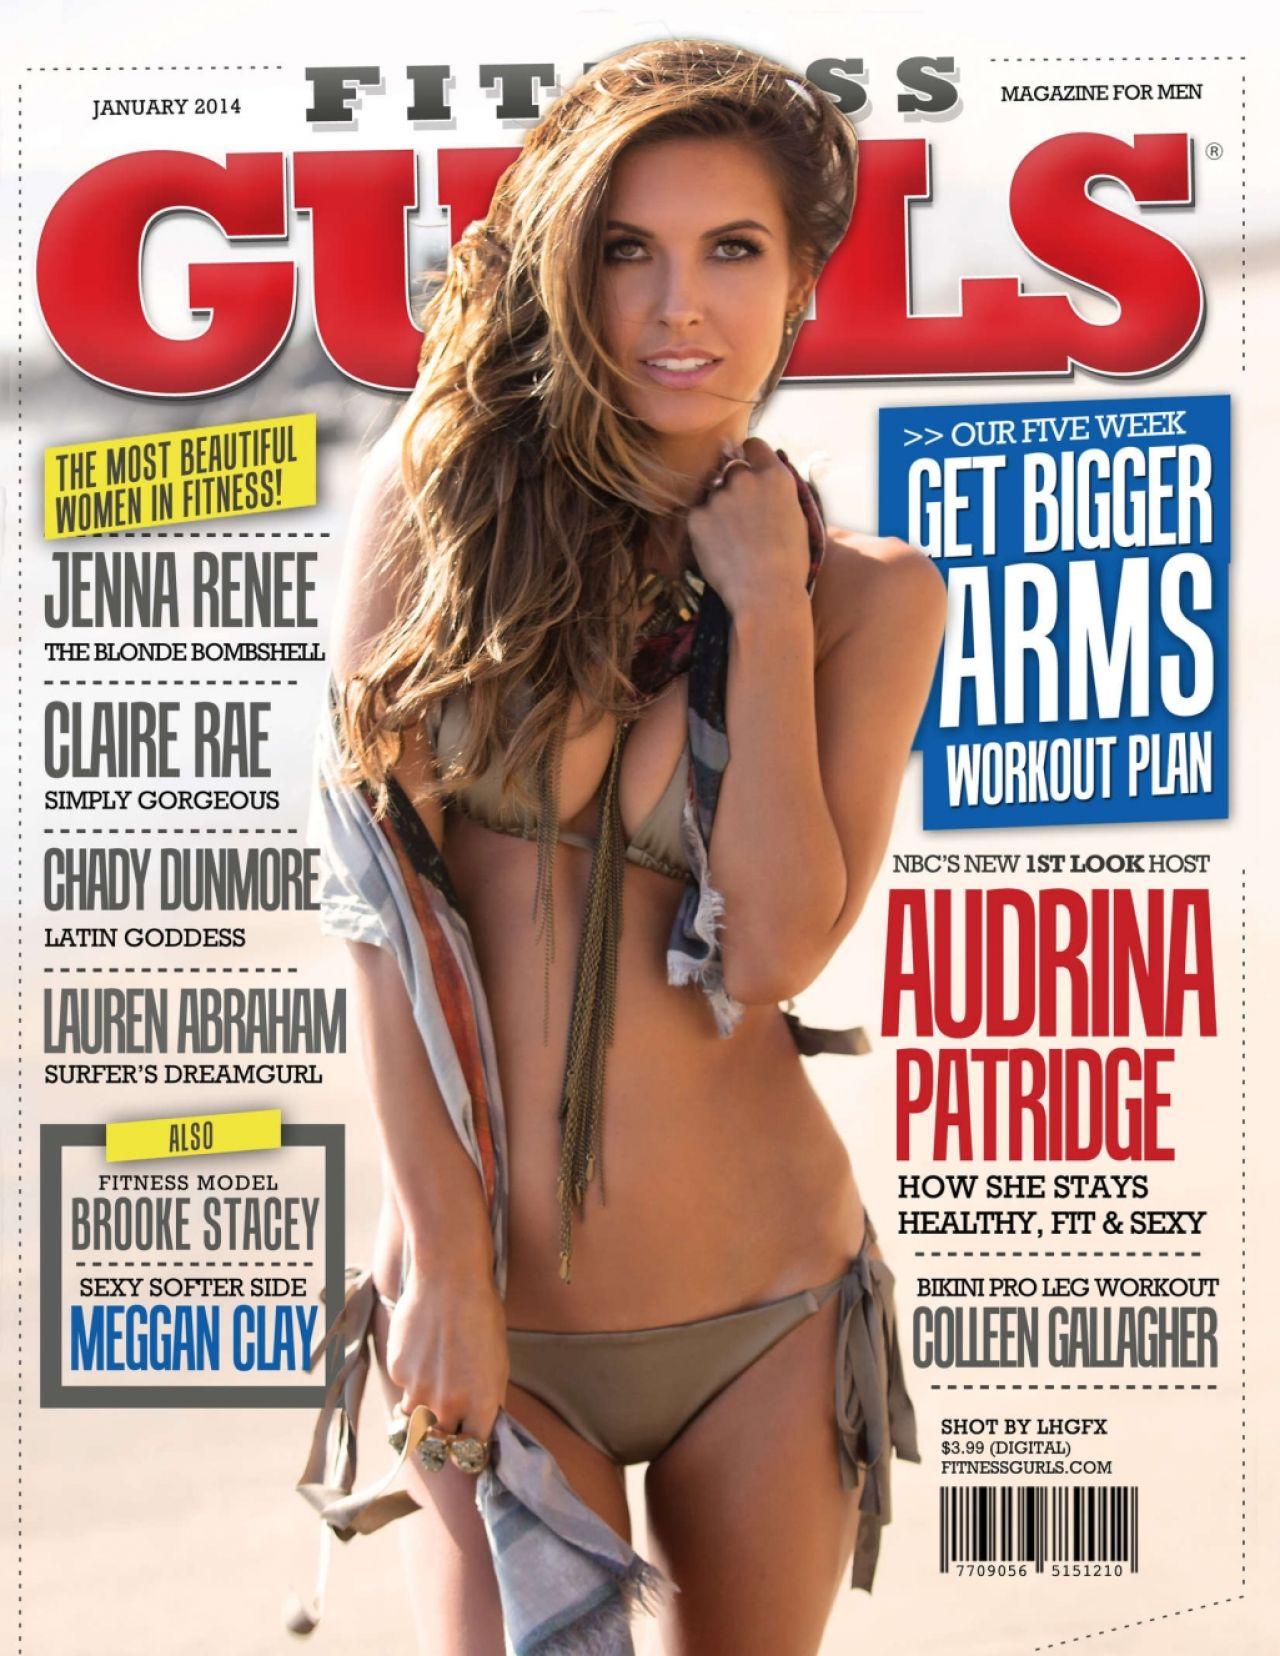 Audrina Patridge - FITNESS GURLS Magazine (USA) - January 2014 Issue